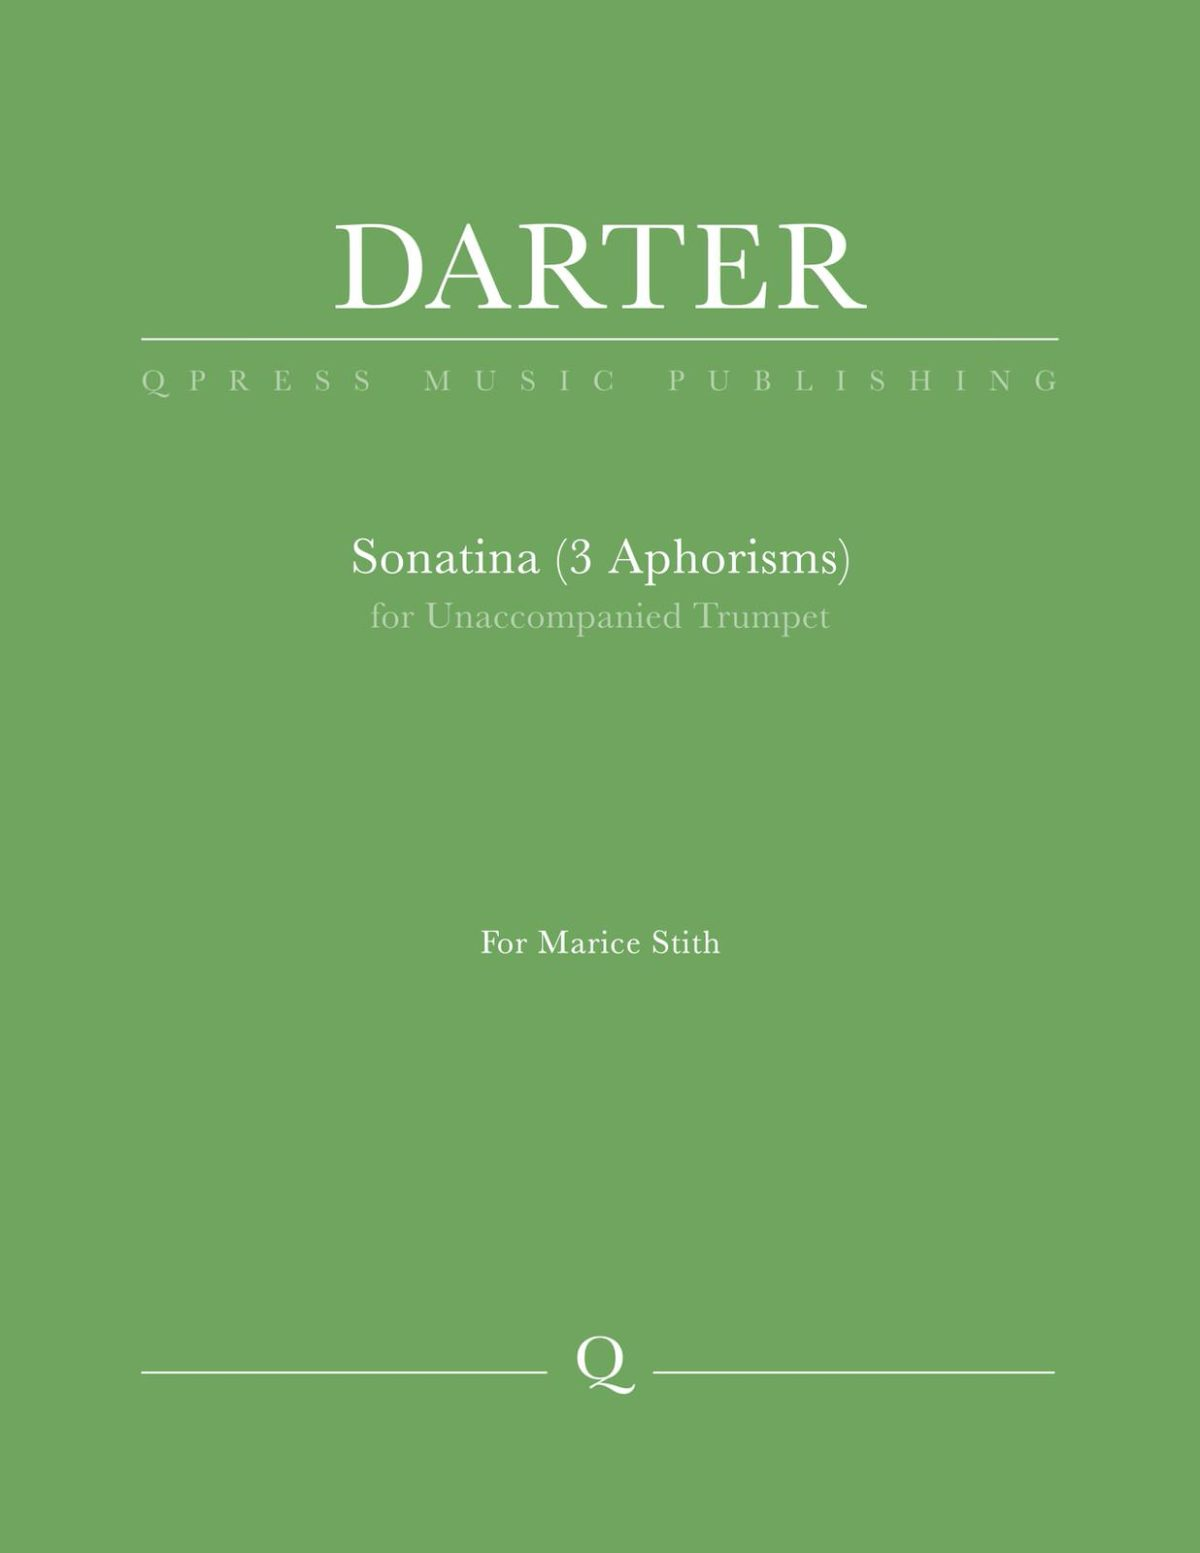 Darter, Sonatina (3 Aphorisms) for Unaccompanied Trumpet-p1